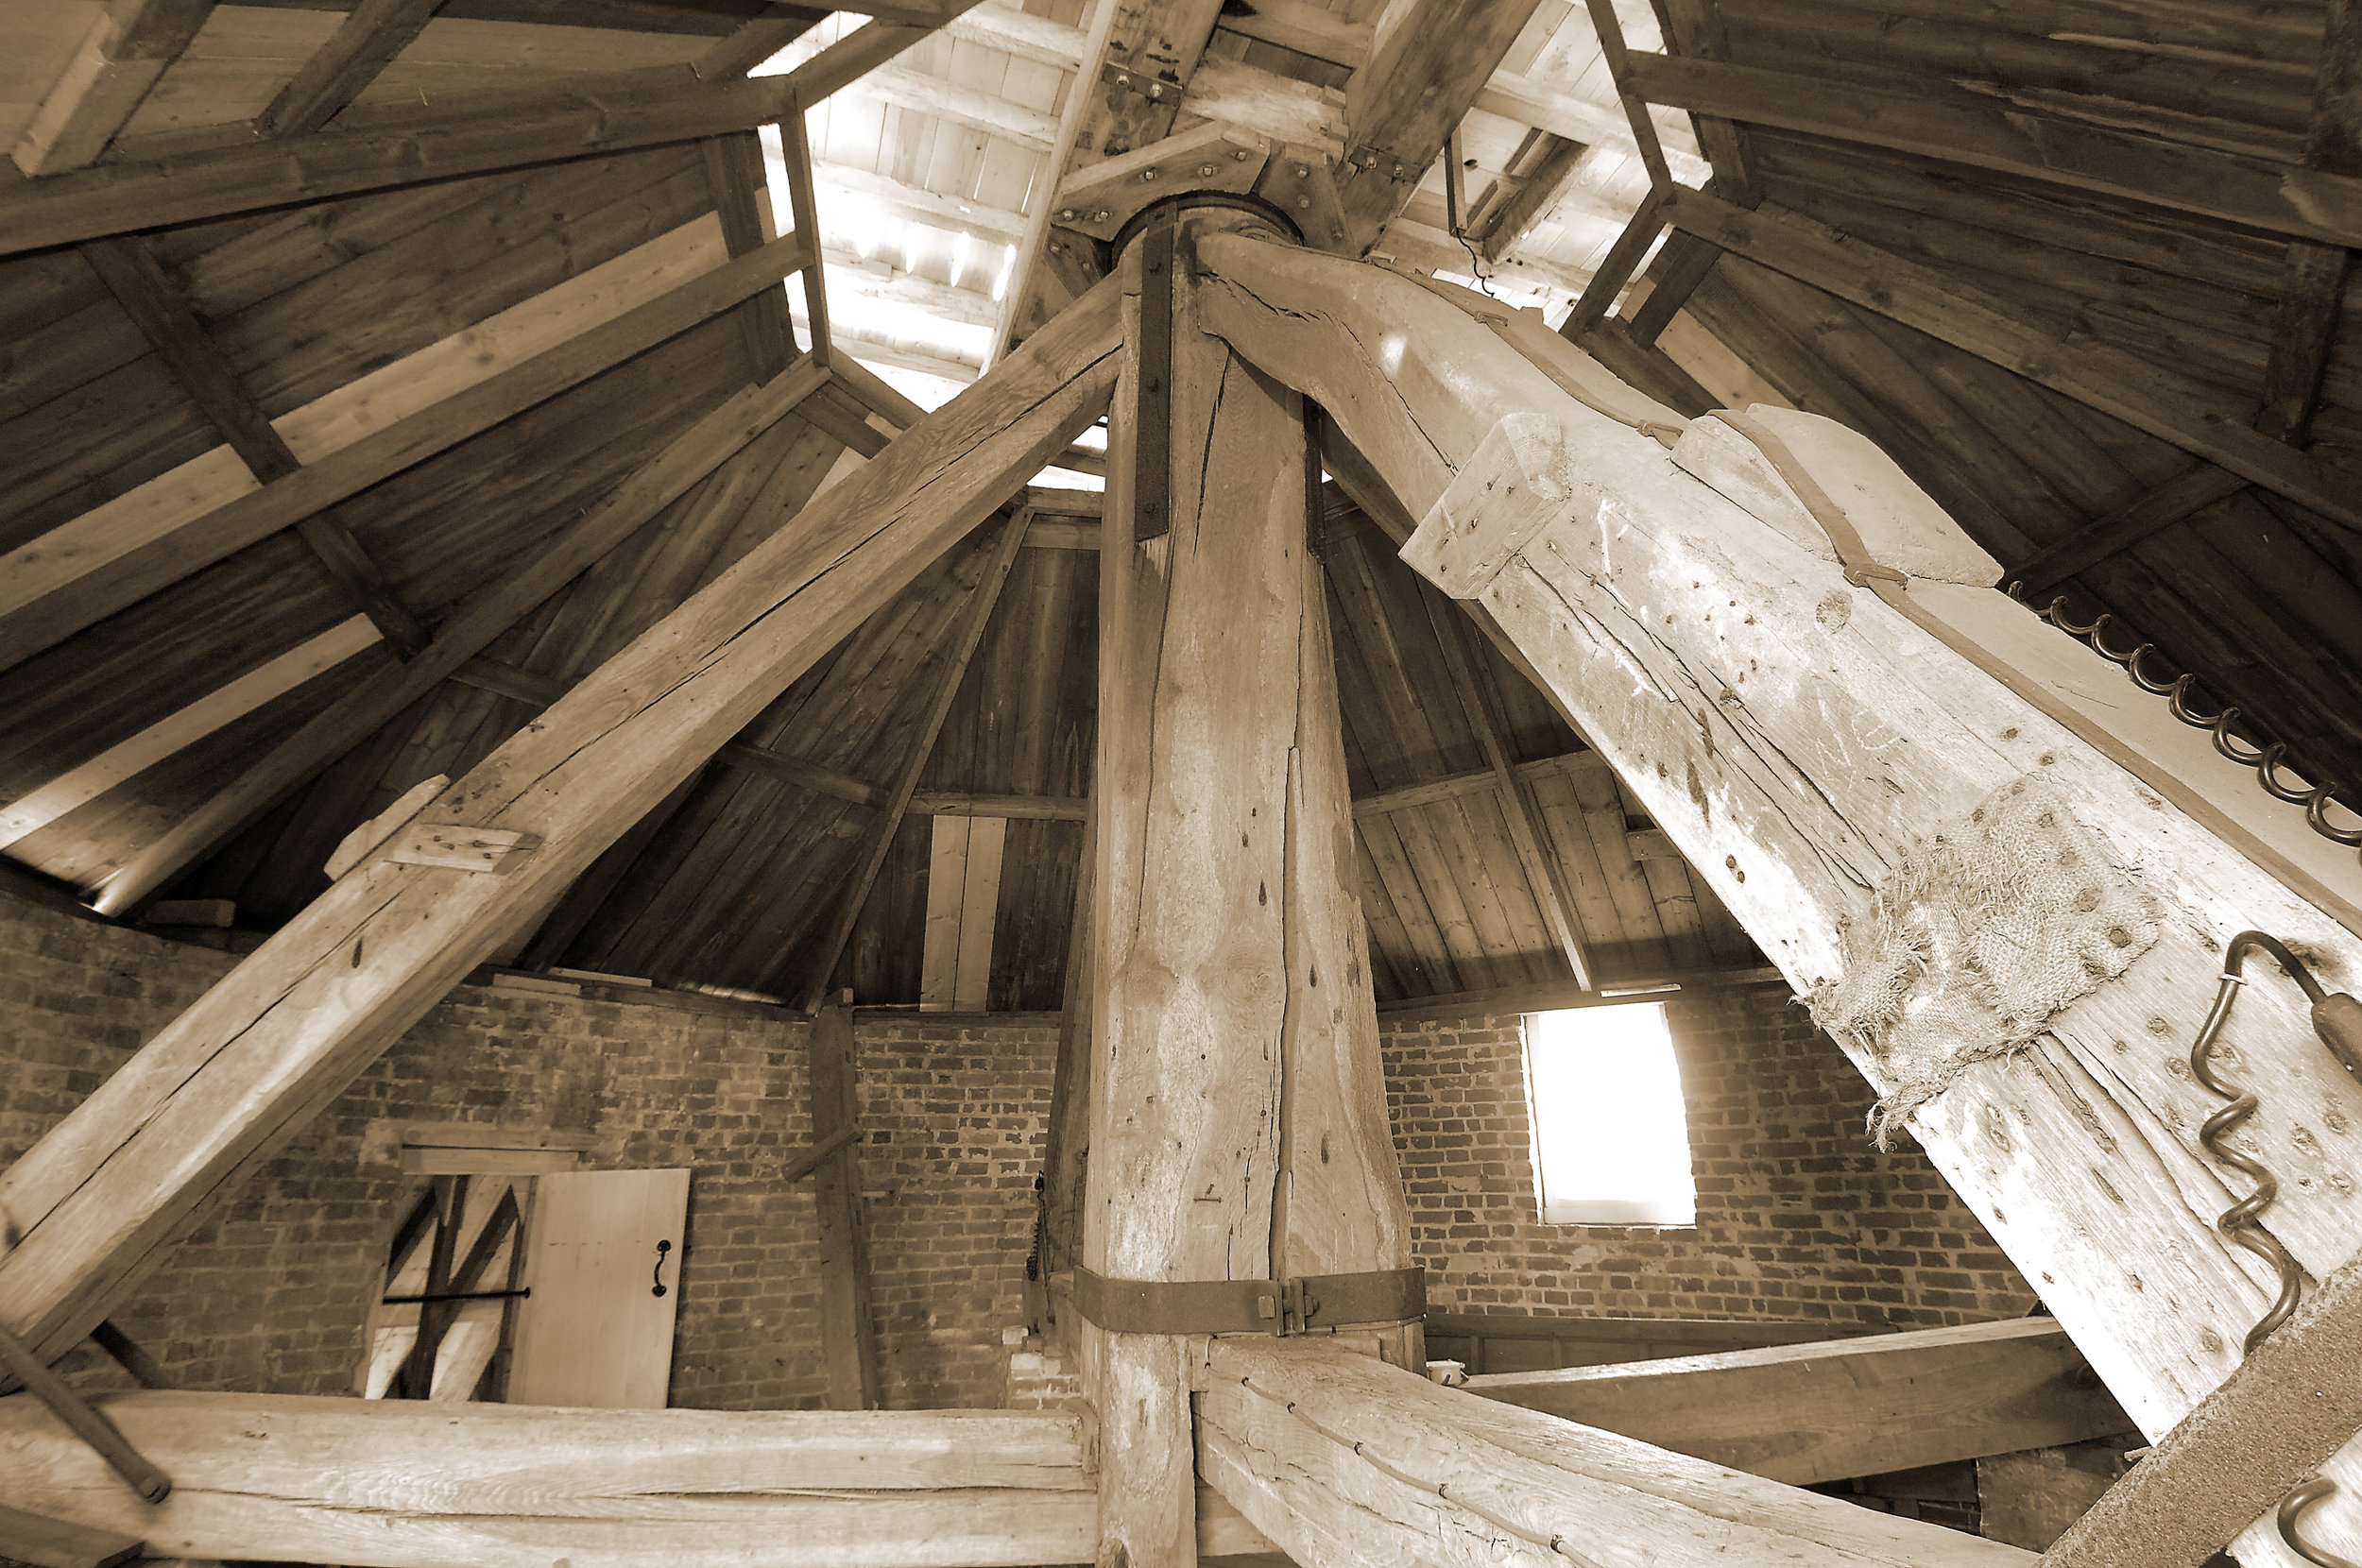 FINE architecture_Windmill_05.JPG